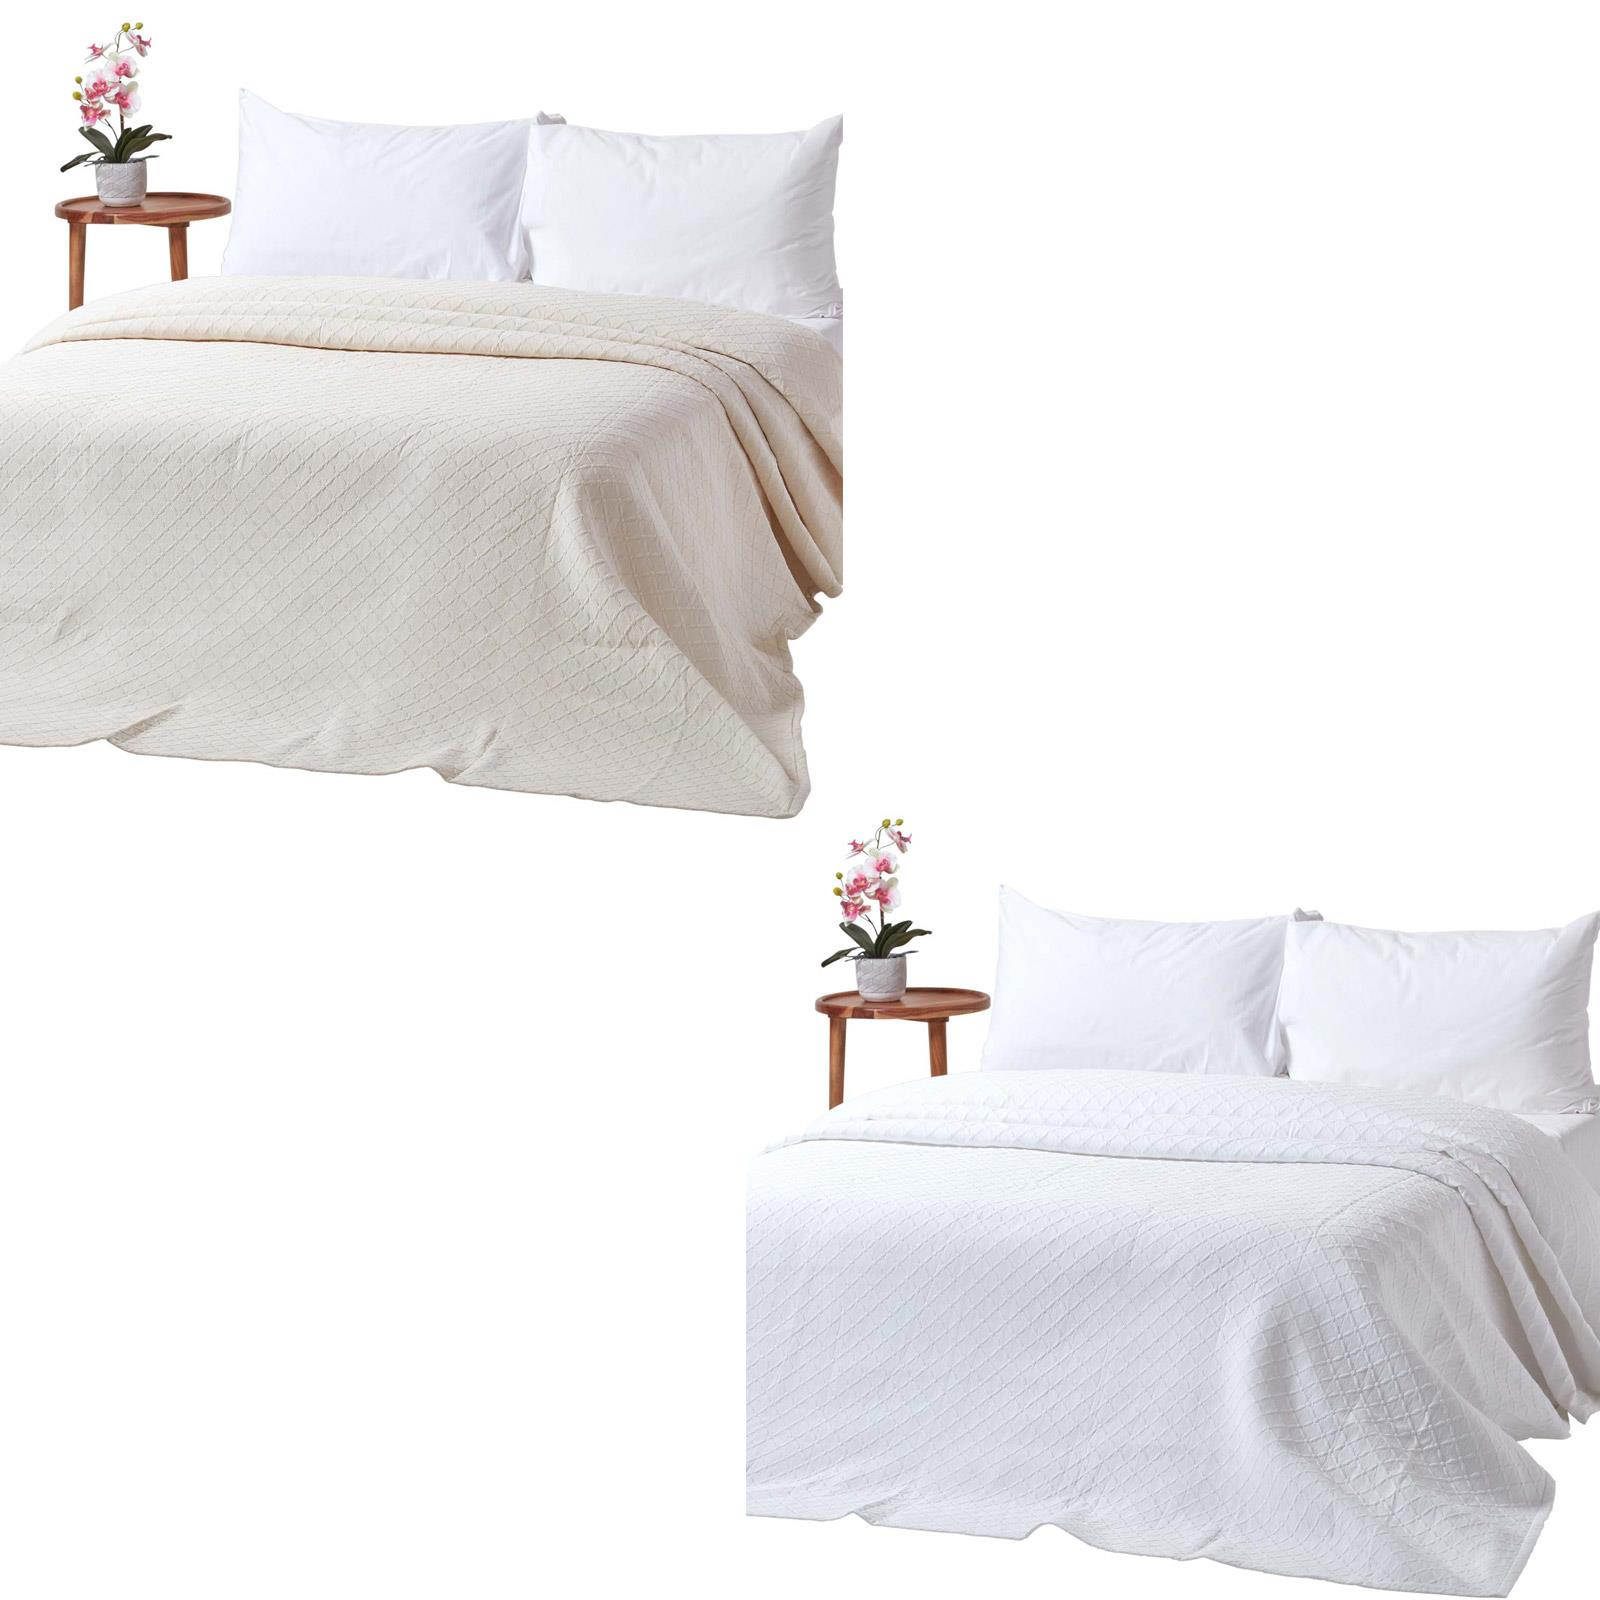 Cotton Bedspreads Cream And White Contemporary Diamond Pattern Matelasse Throws Ebay